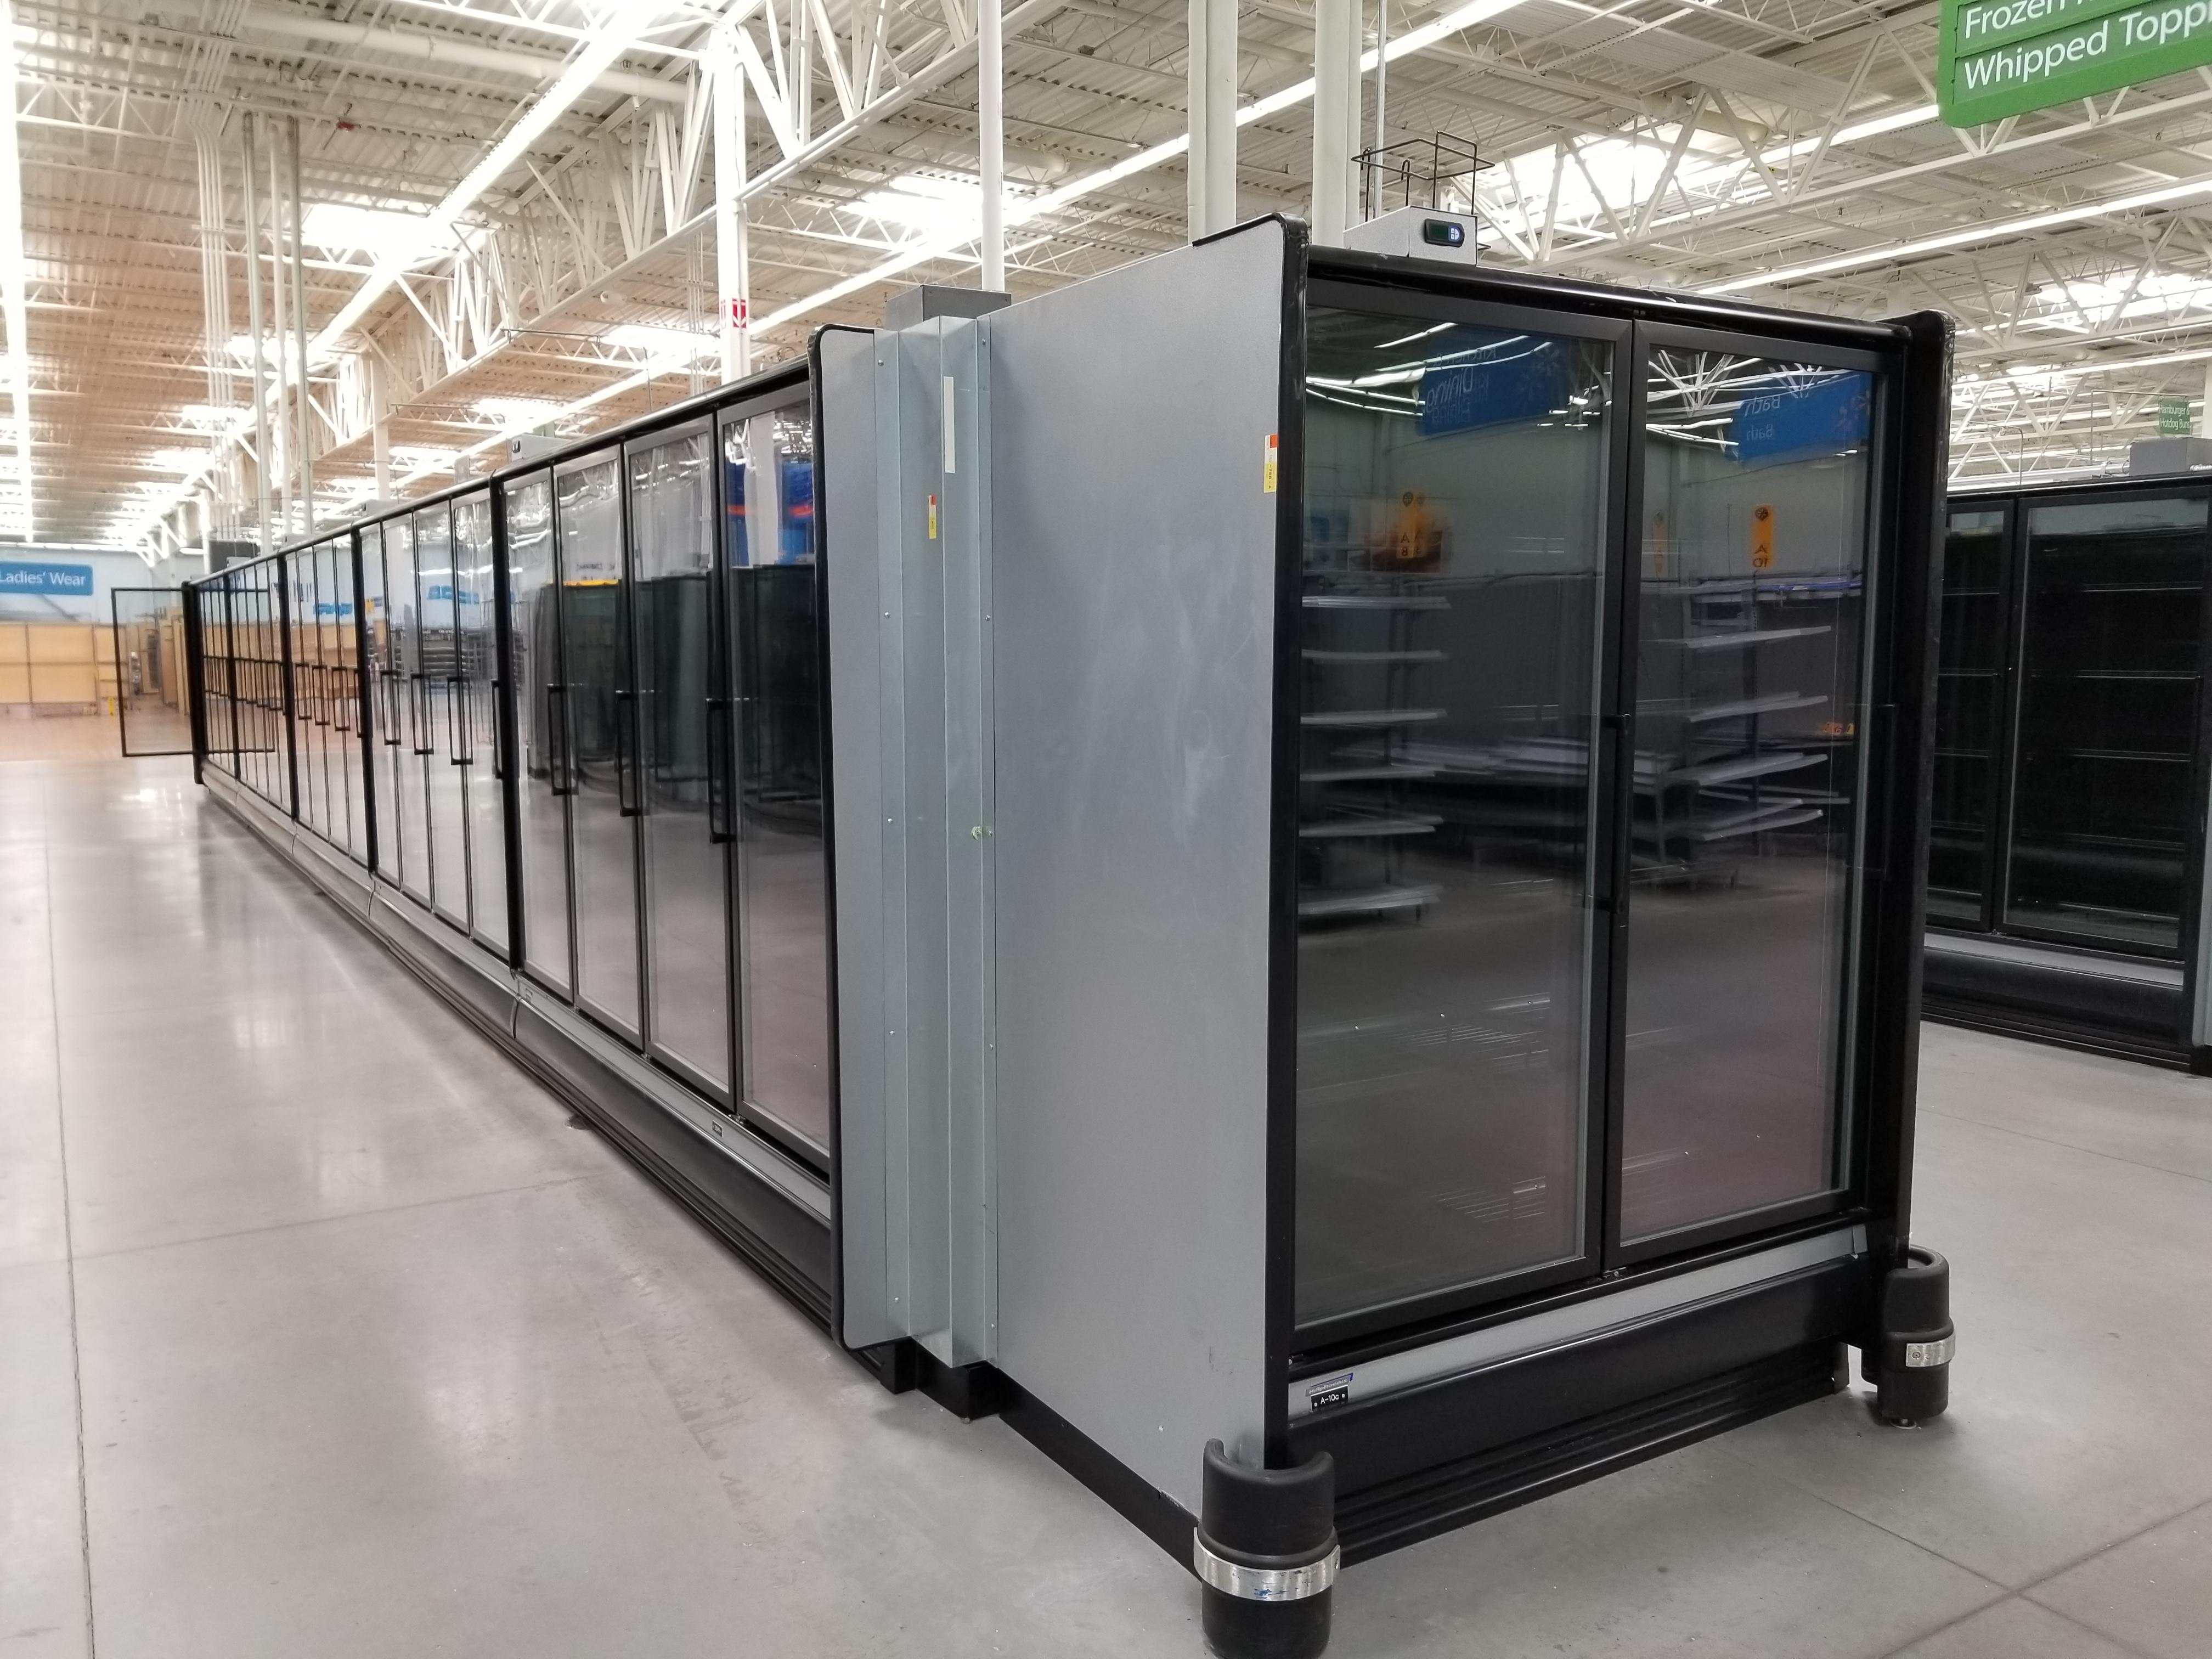 Walmart Store Equipment Liquidation Sale